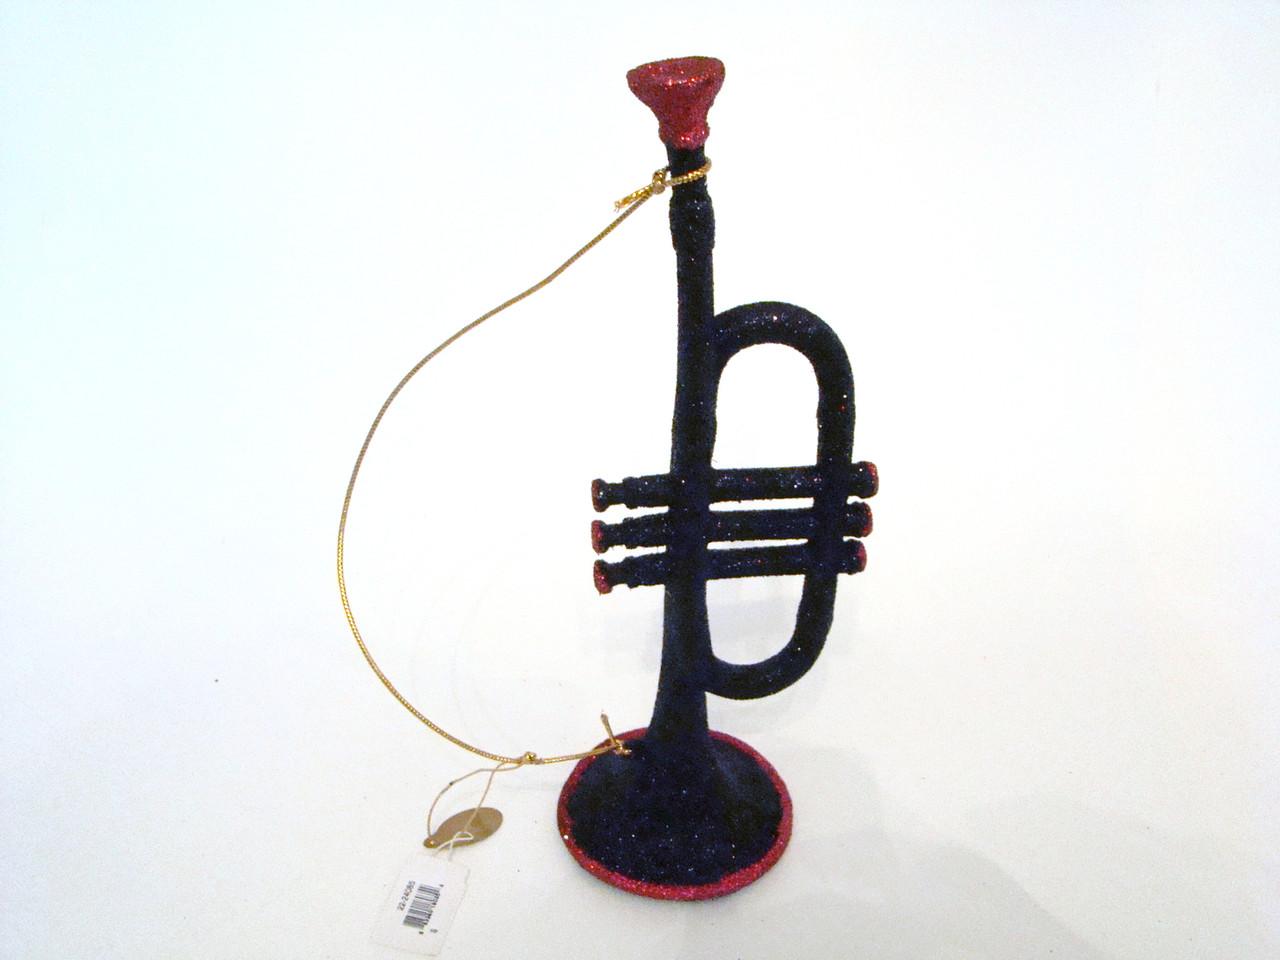 Katherine's Collection Large Trumpet Ornament (22-24085Trumpet)